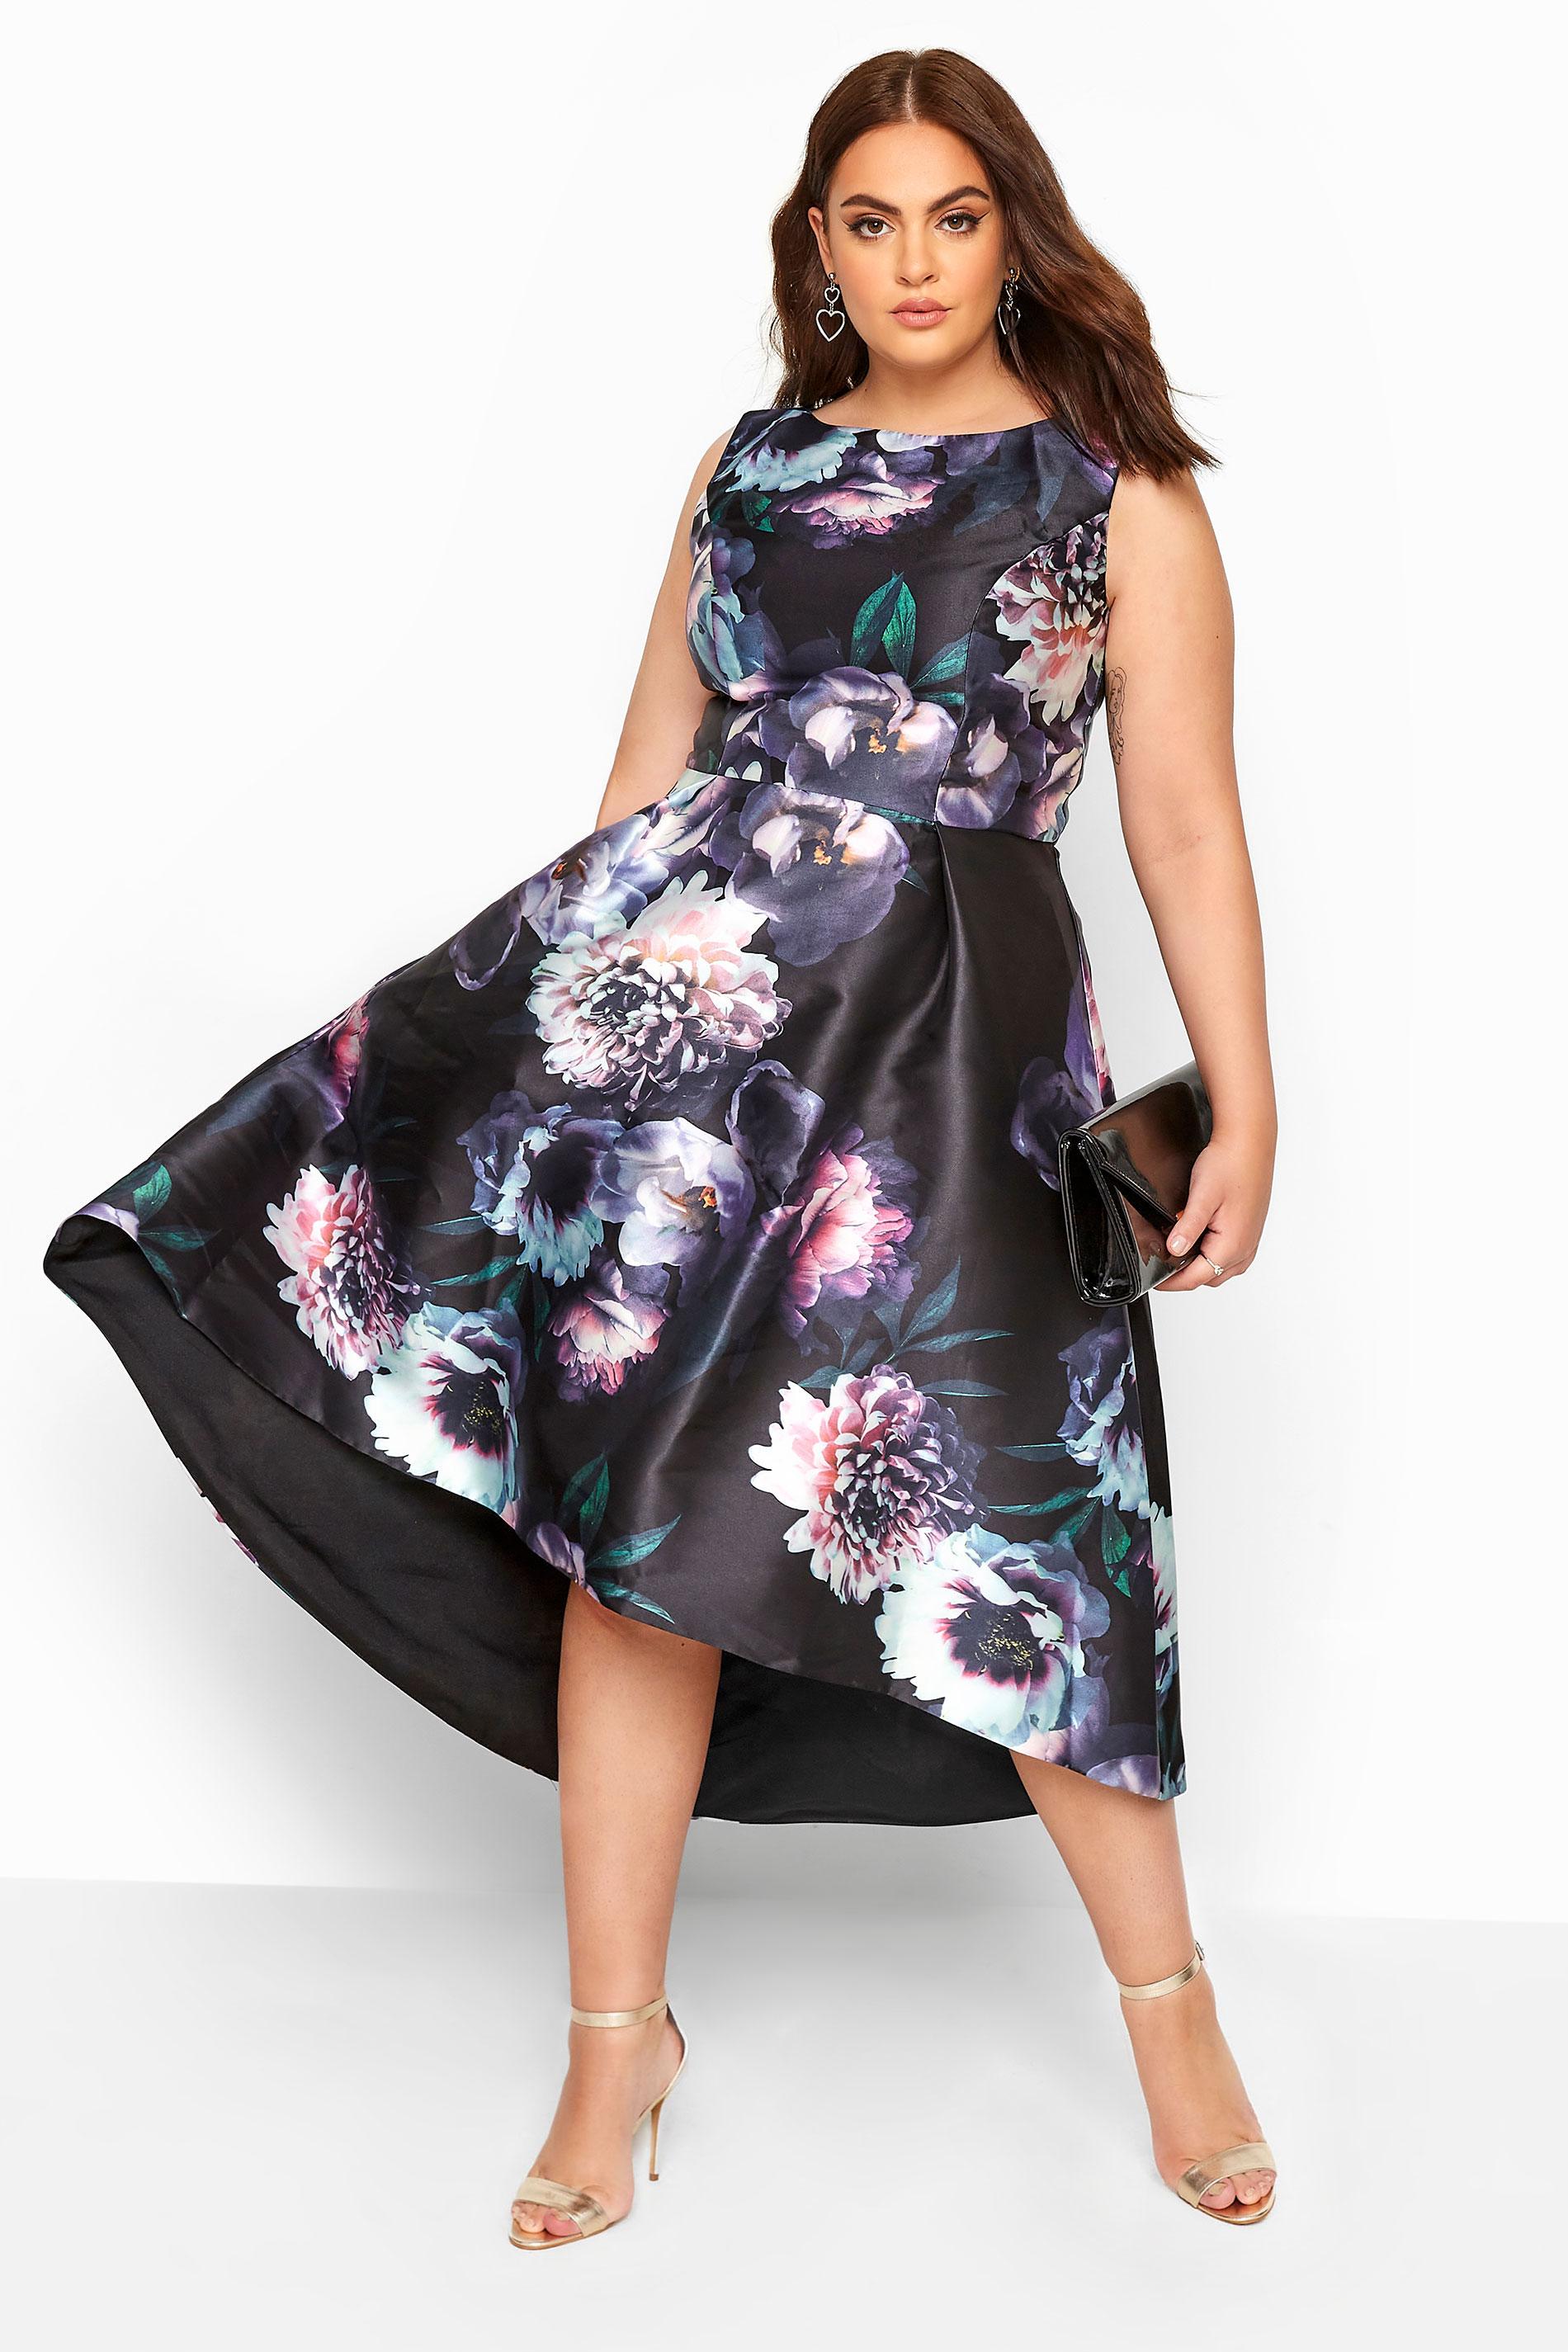 CHI CHI Black Floral High Low Dress